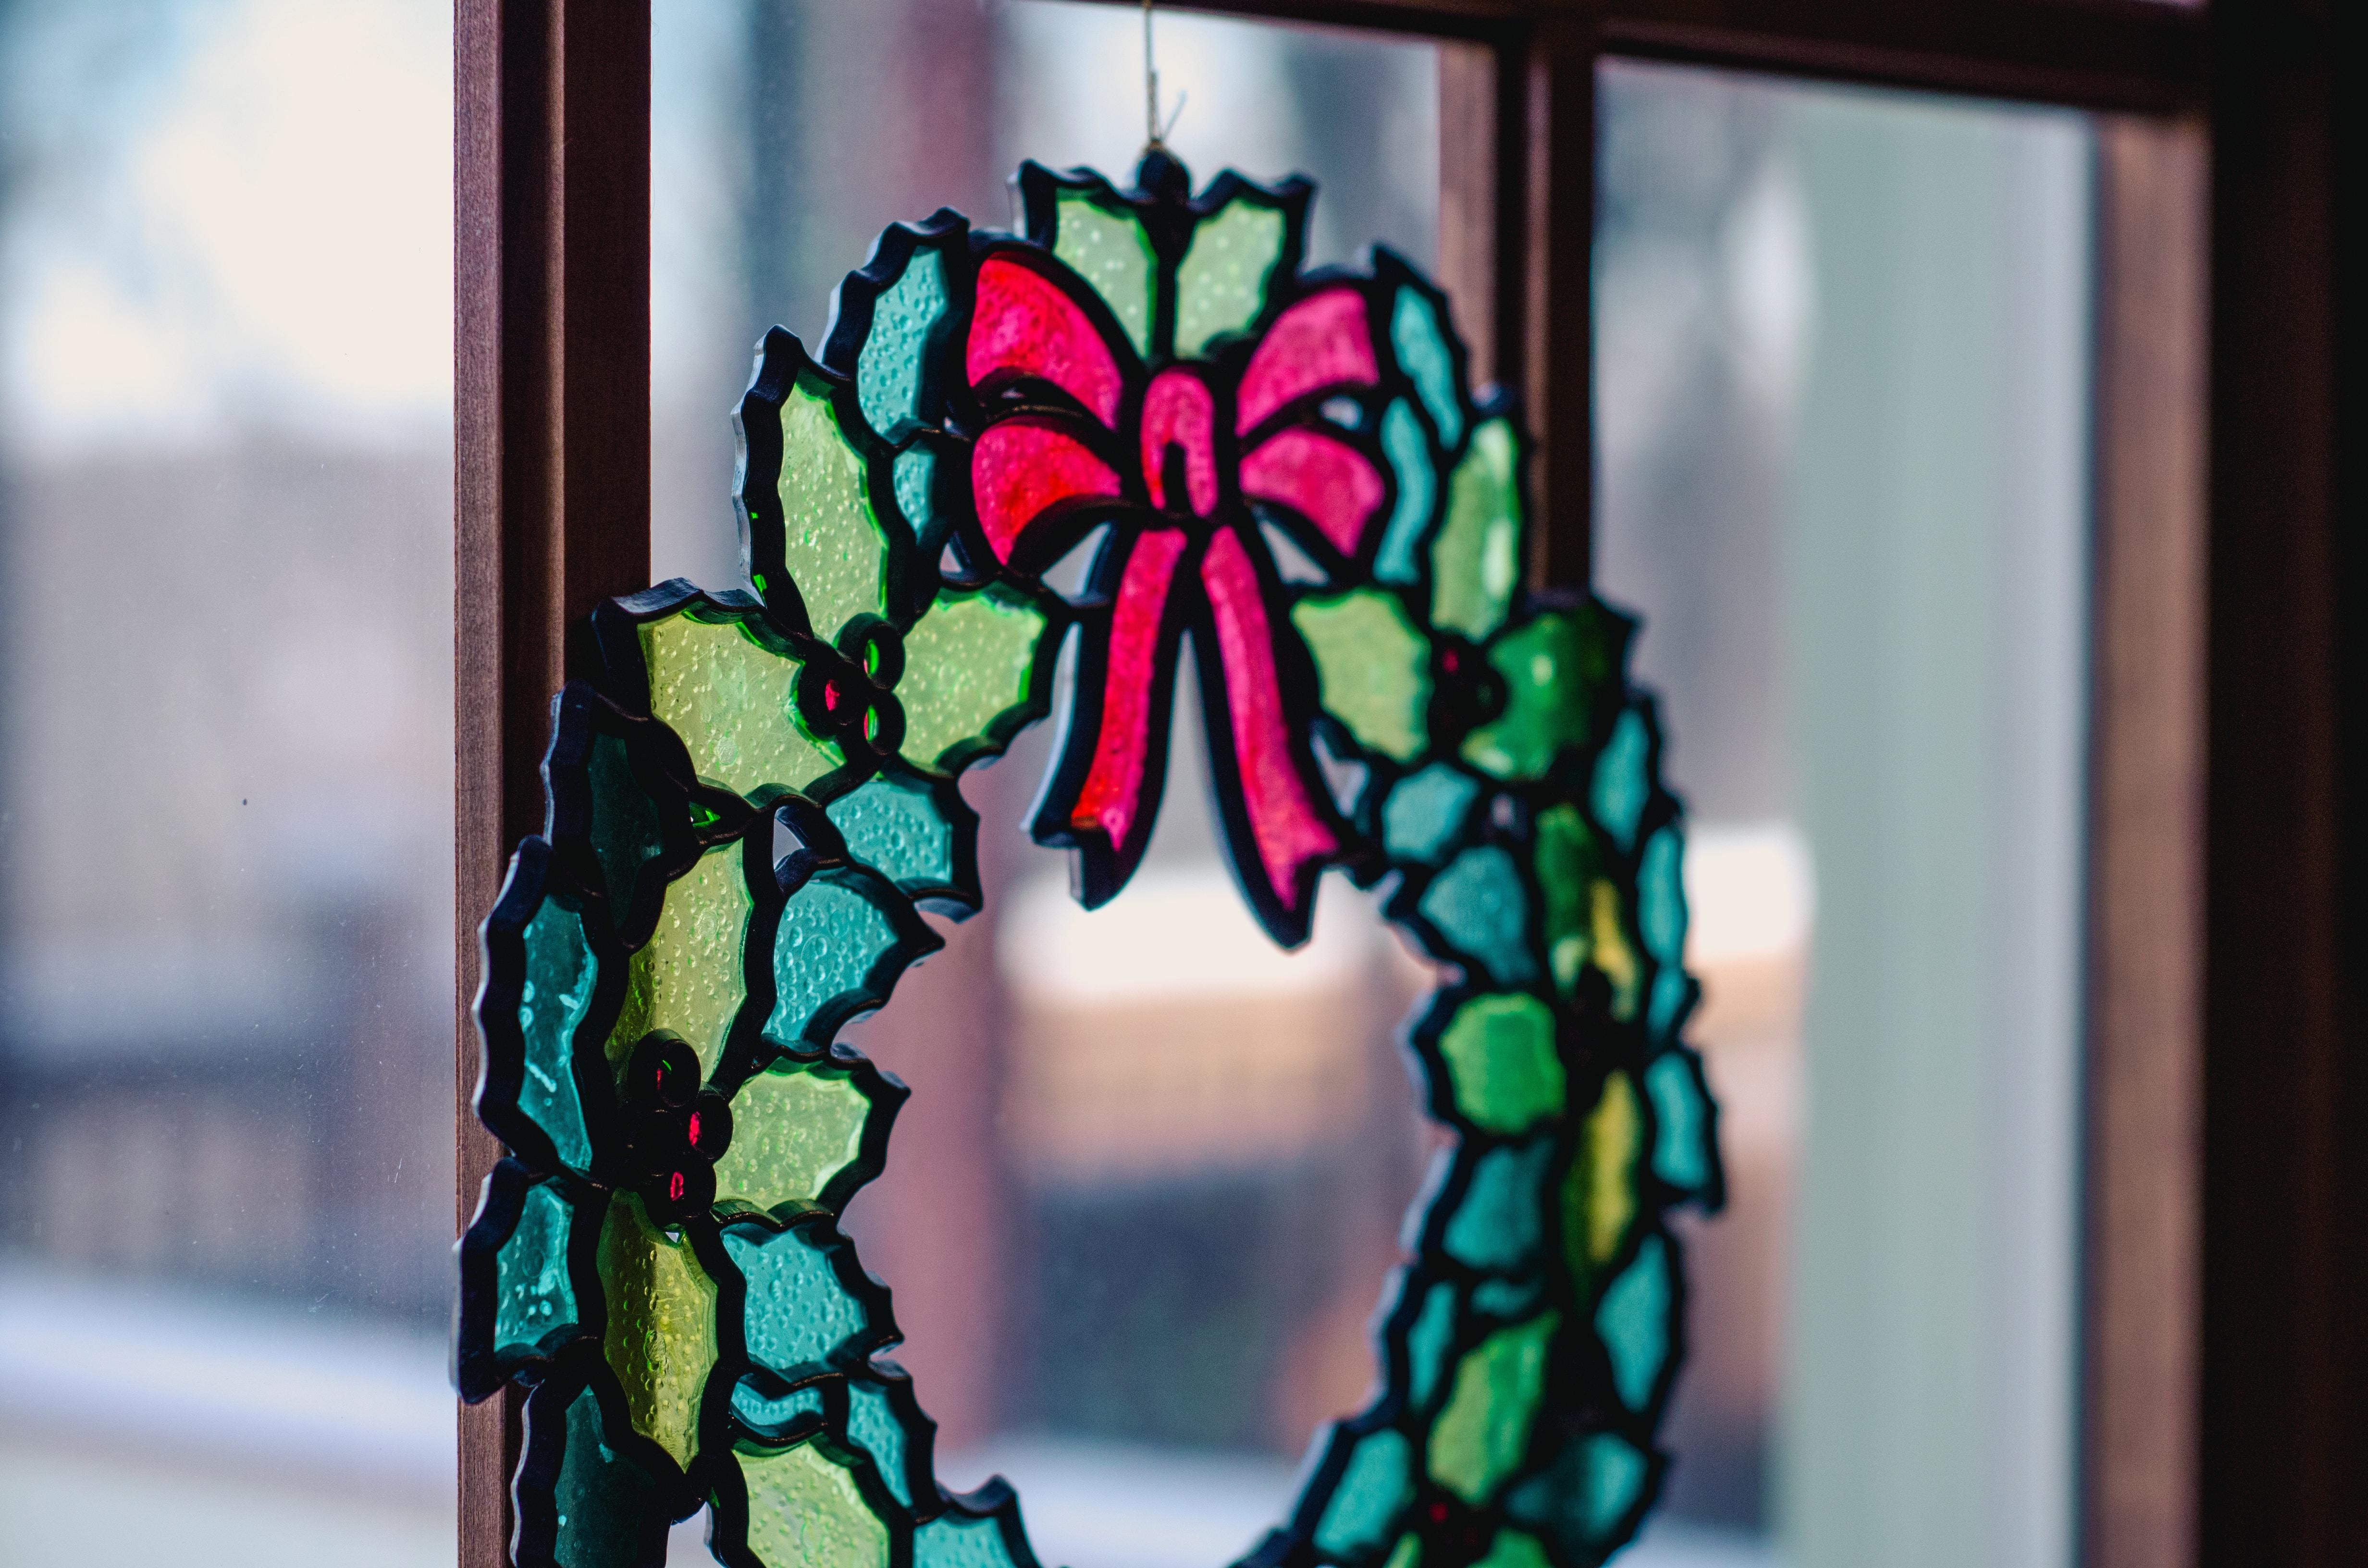 Christmas decor hanging at glass window